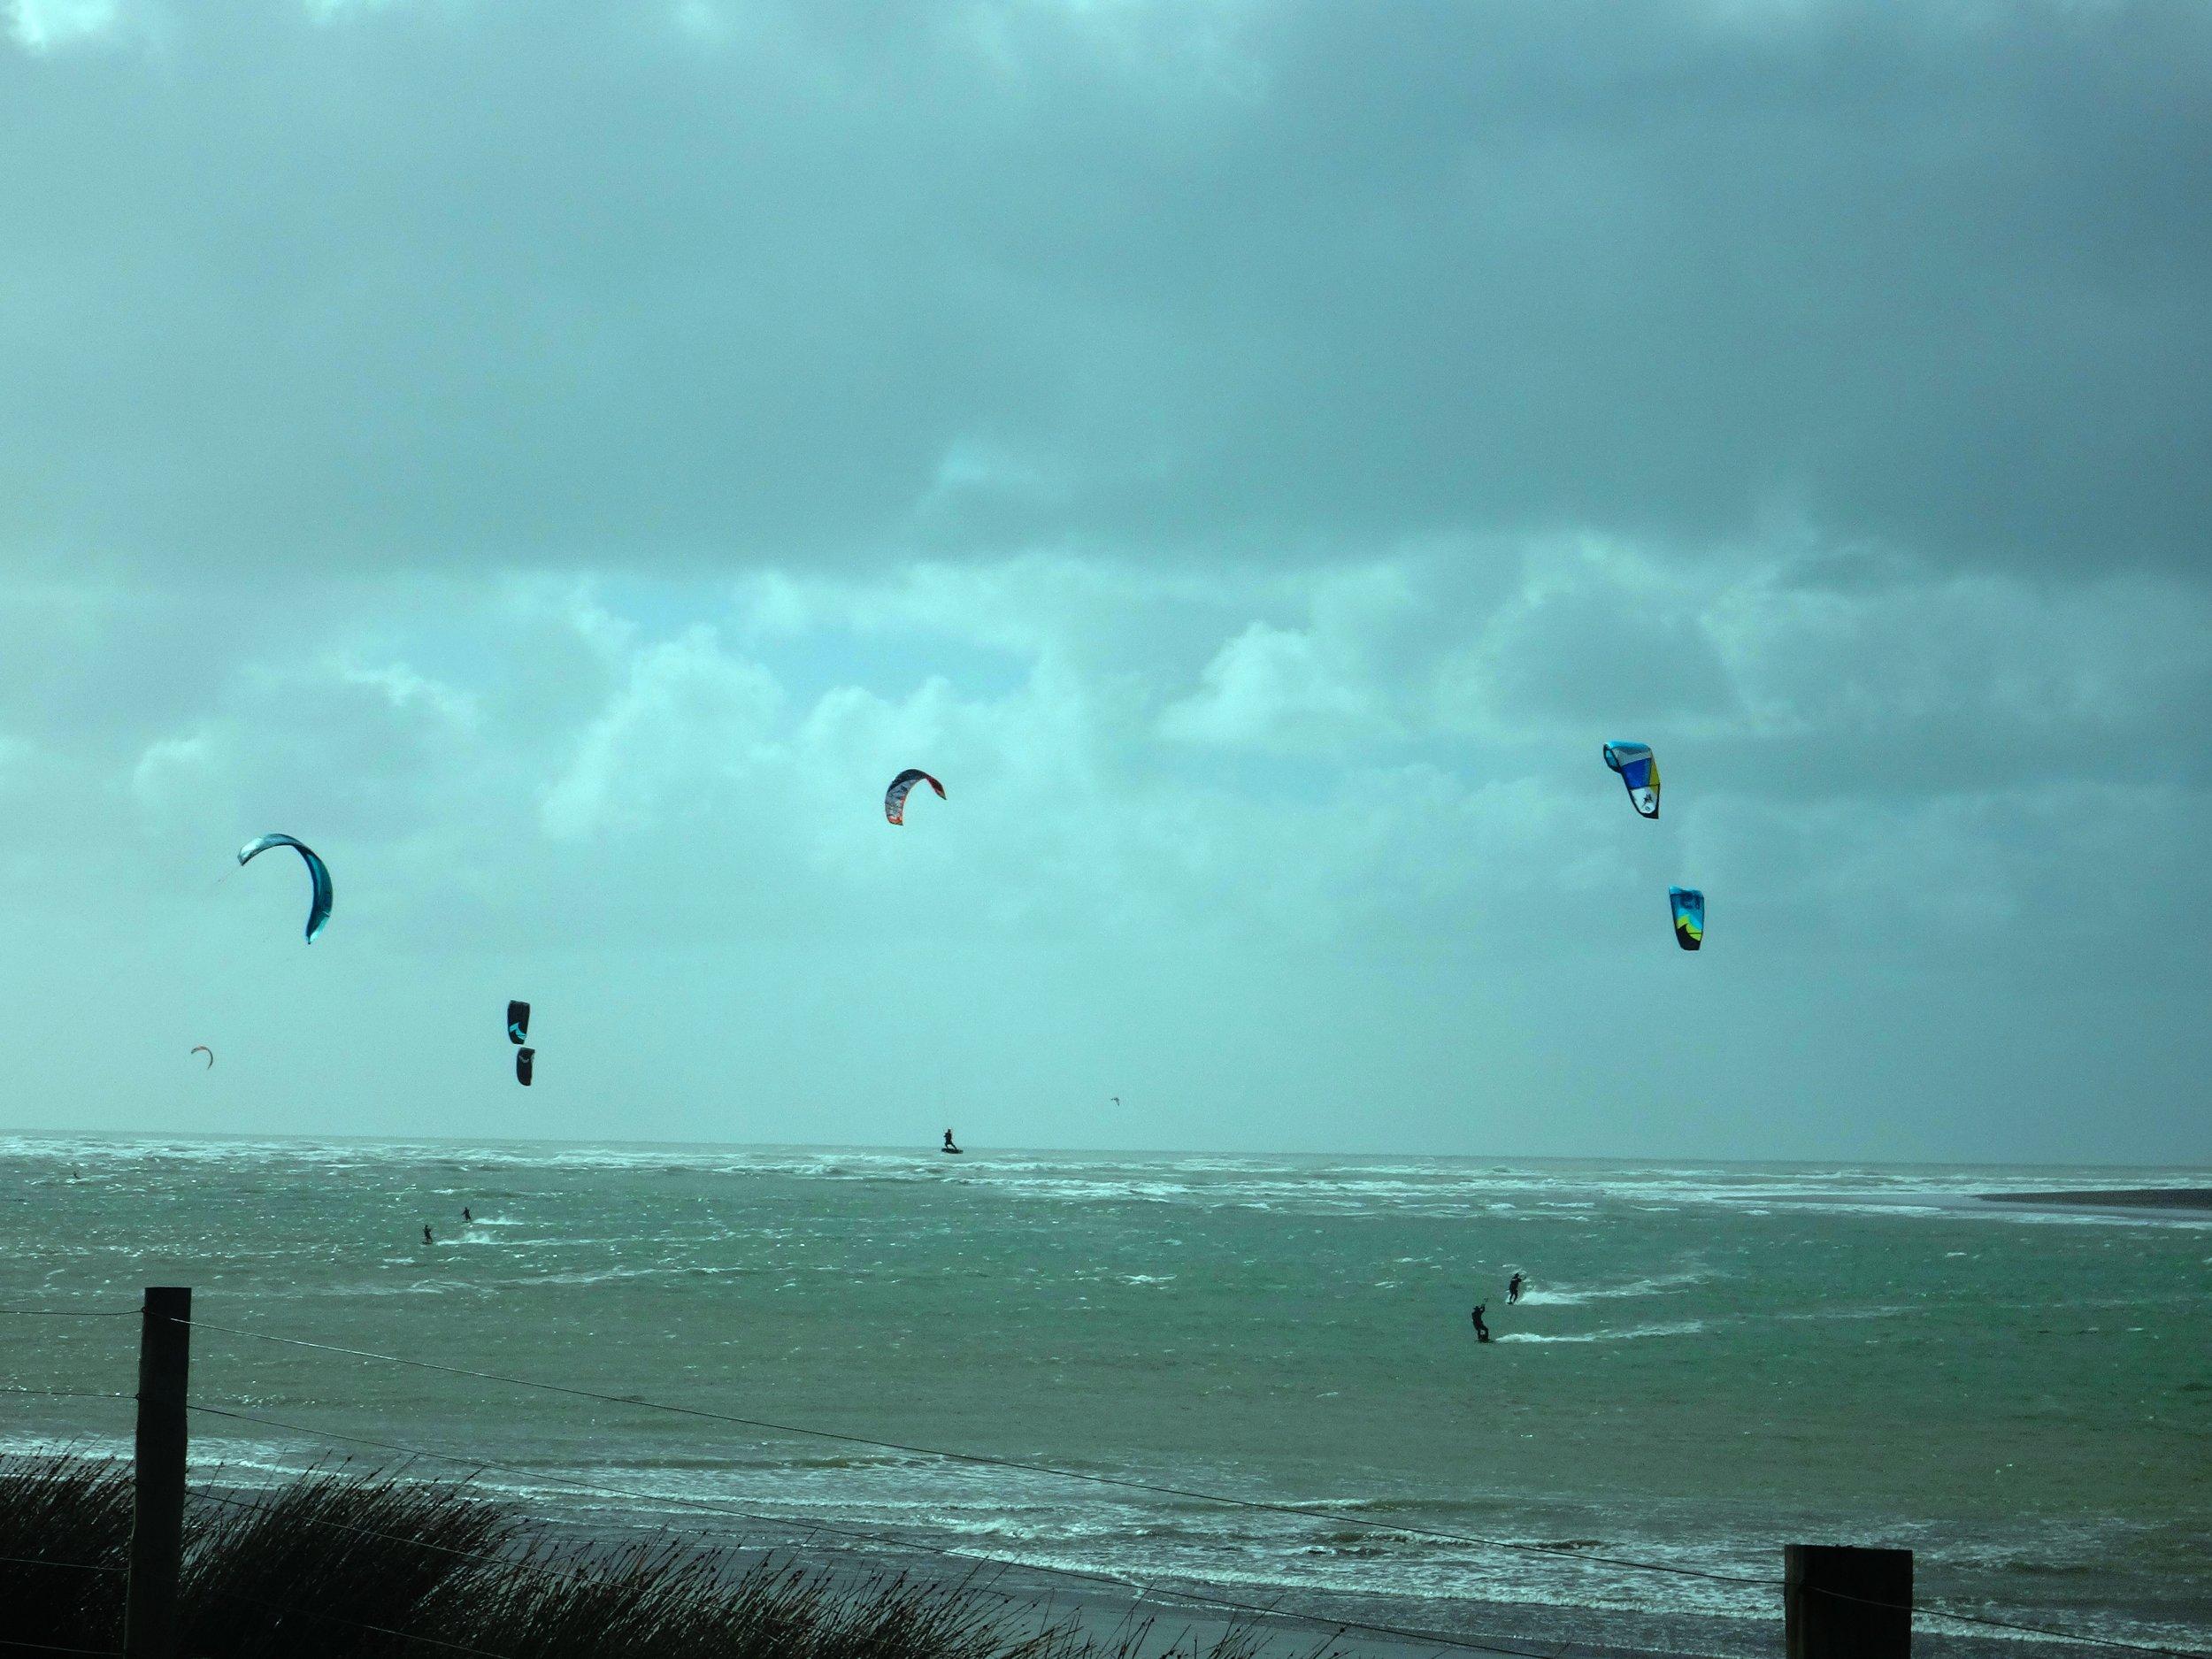 Kite surfing gurus.